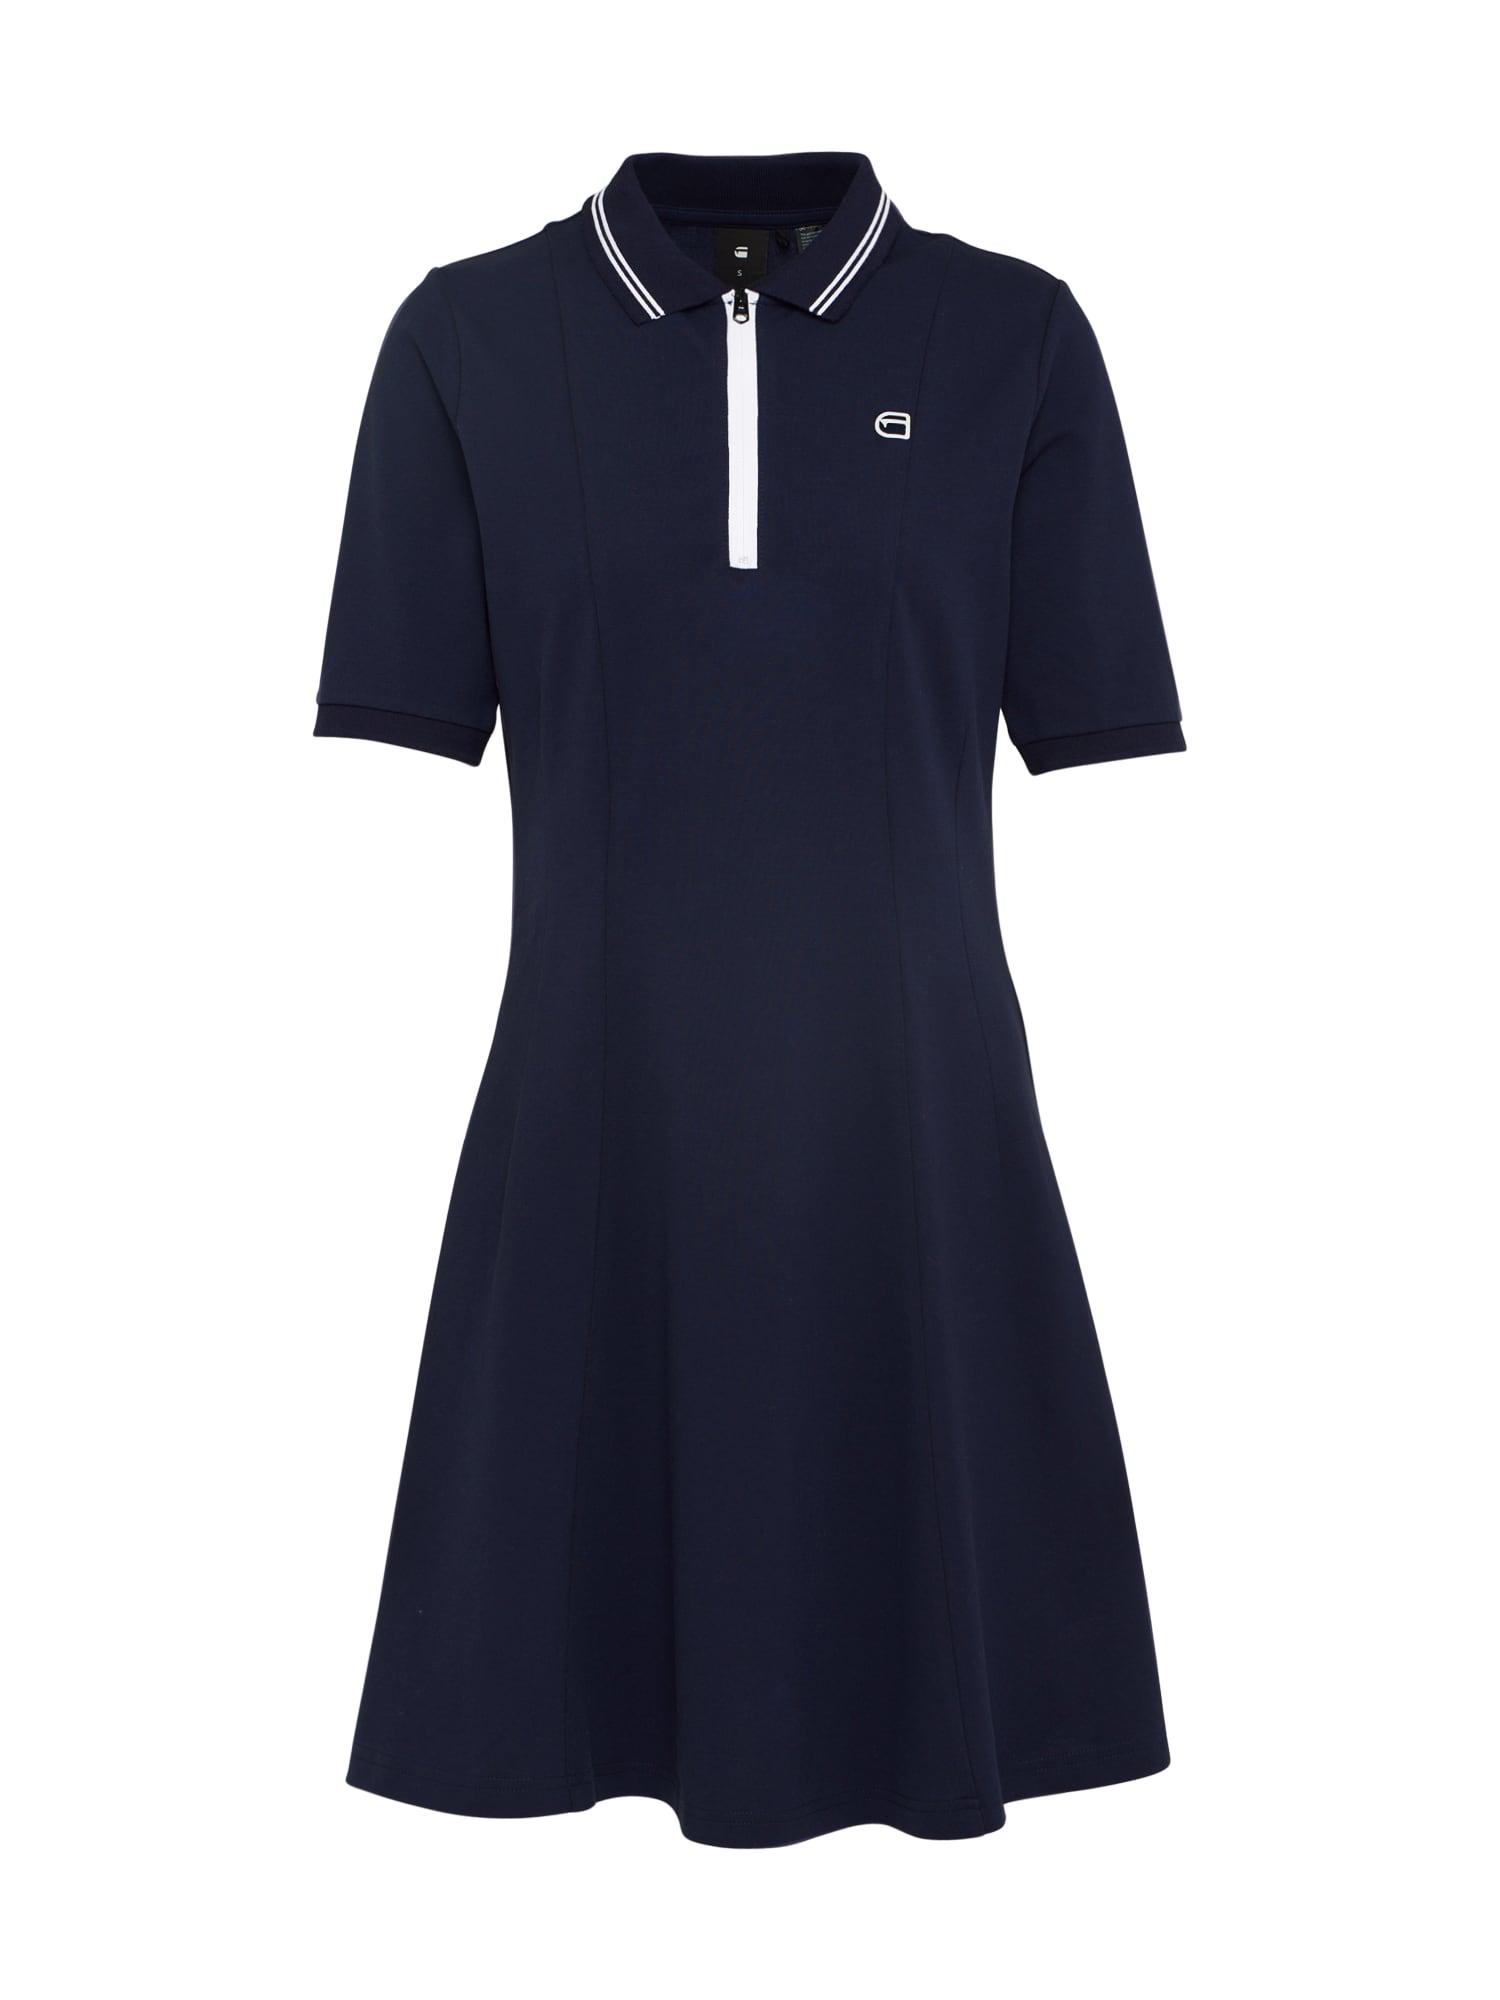 G-STAR RAW Dames Jurk Polo flare dress navy